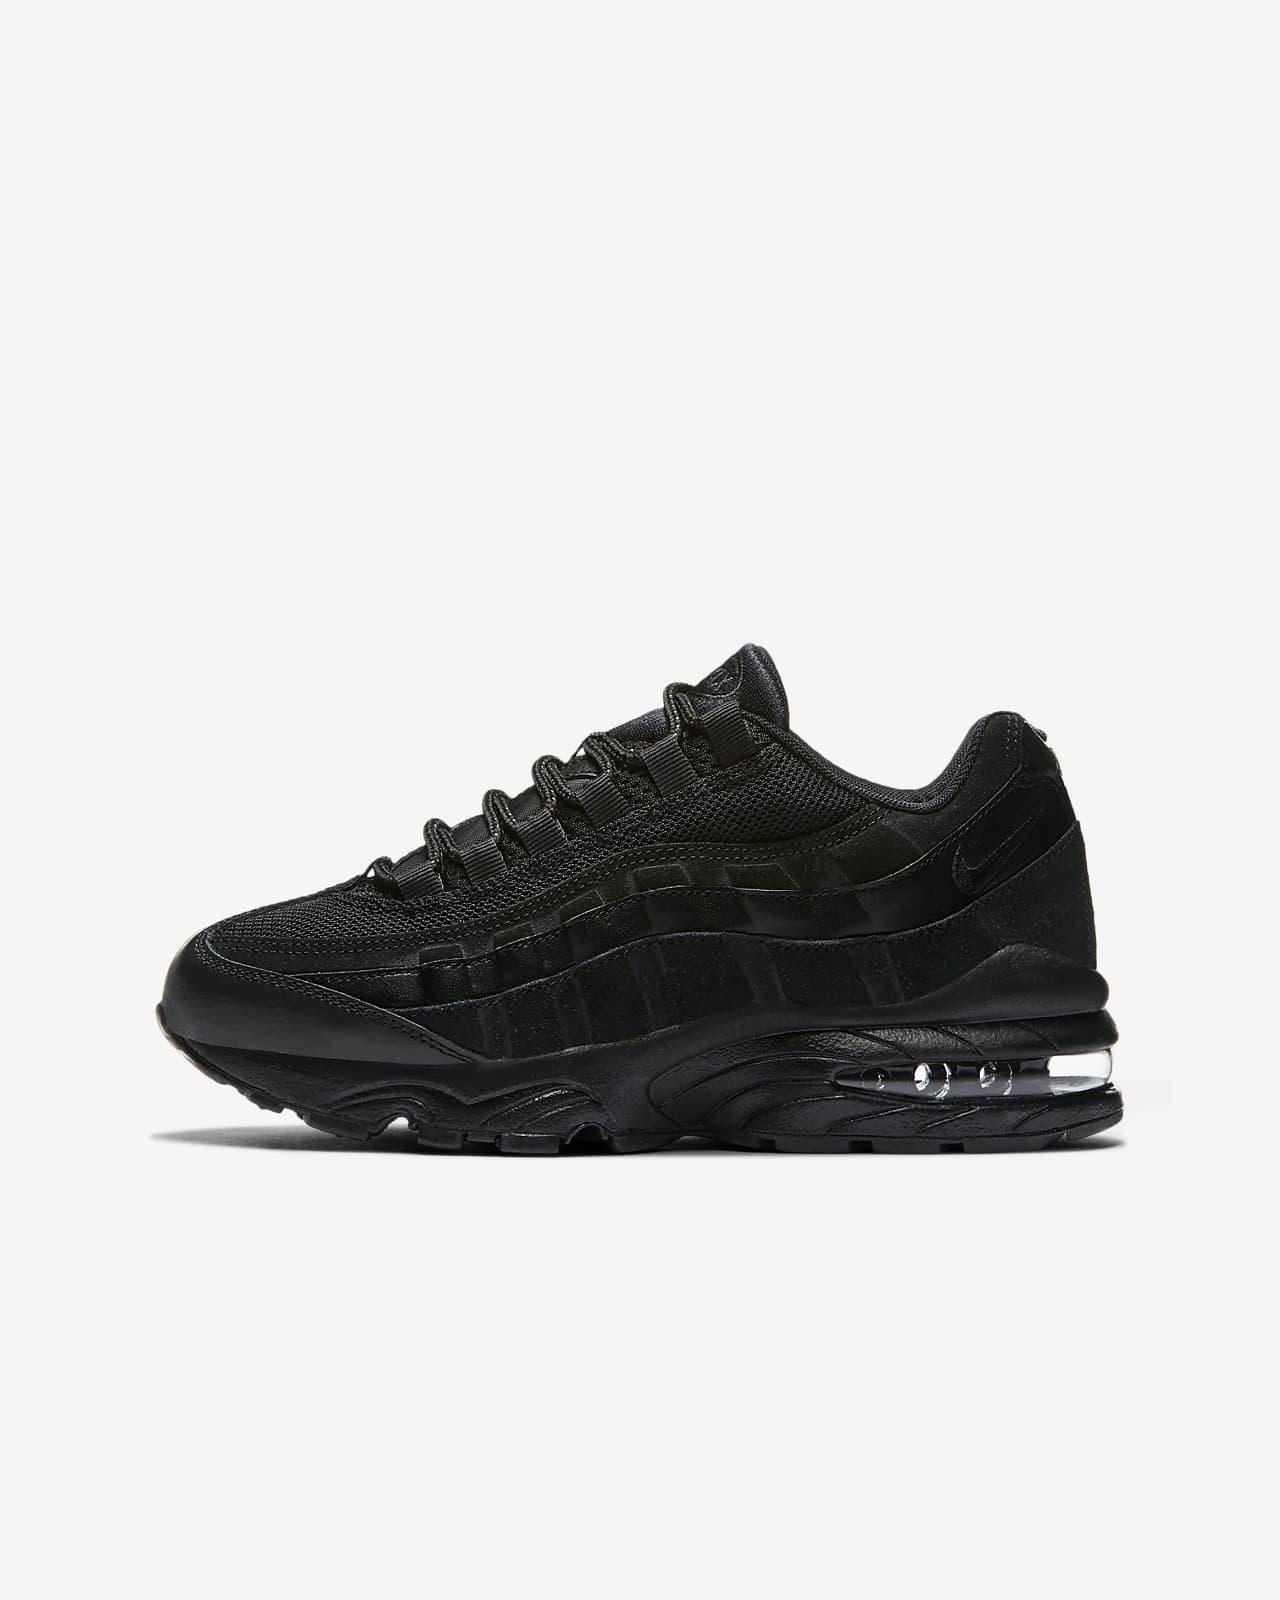 Buty dla dużych dzieci Nike Air Max 95